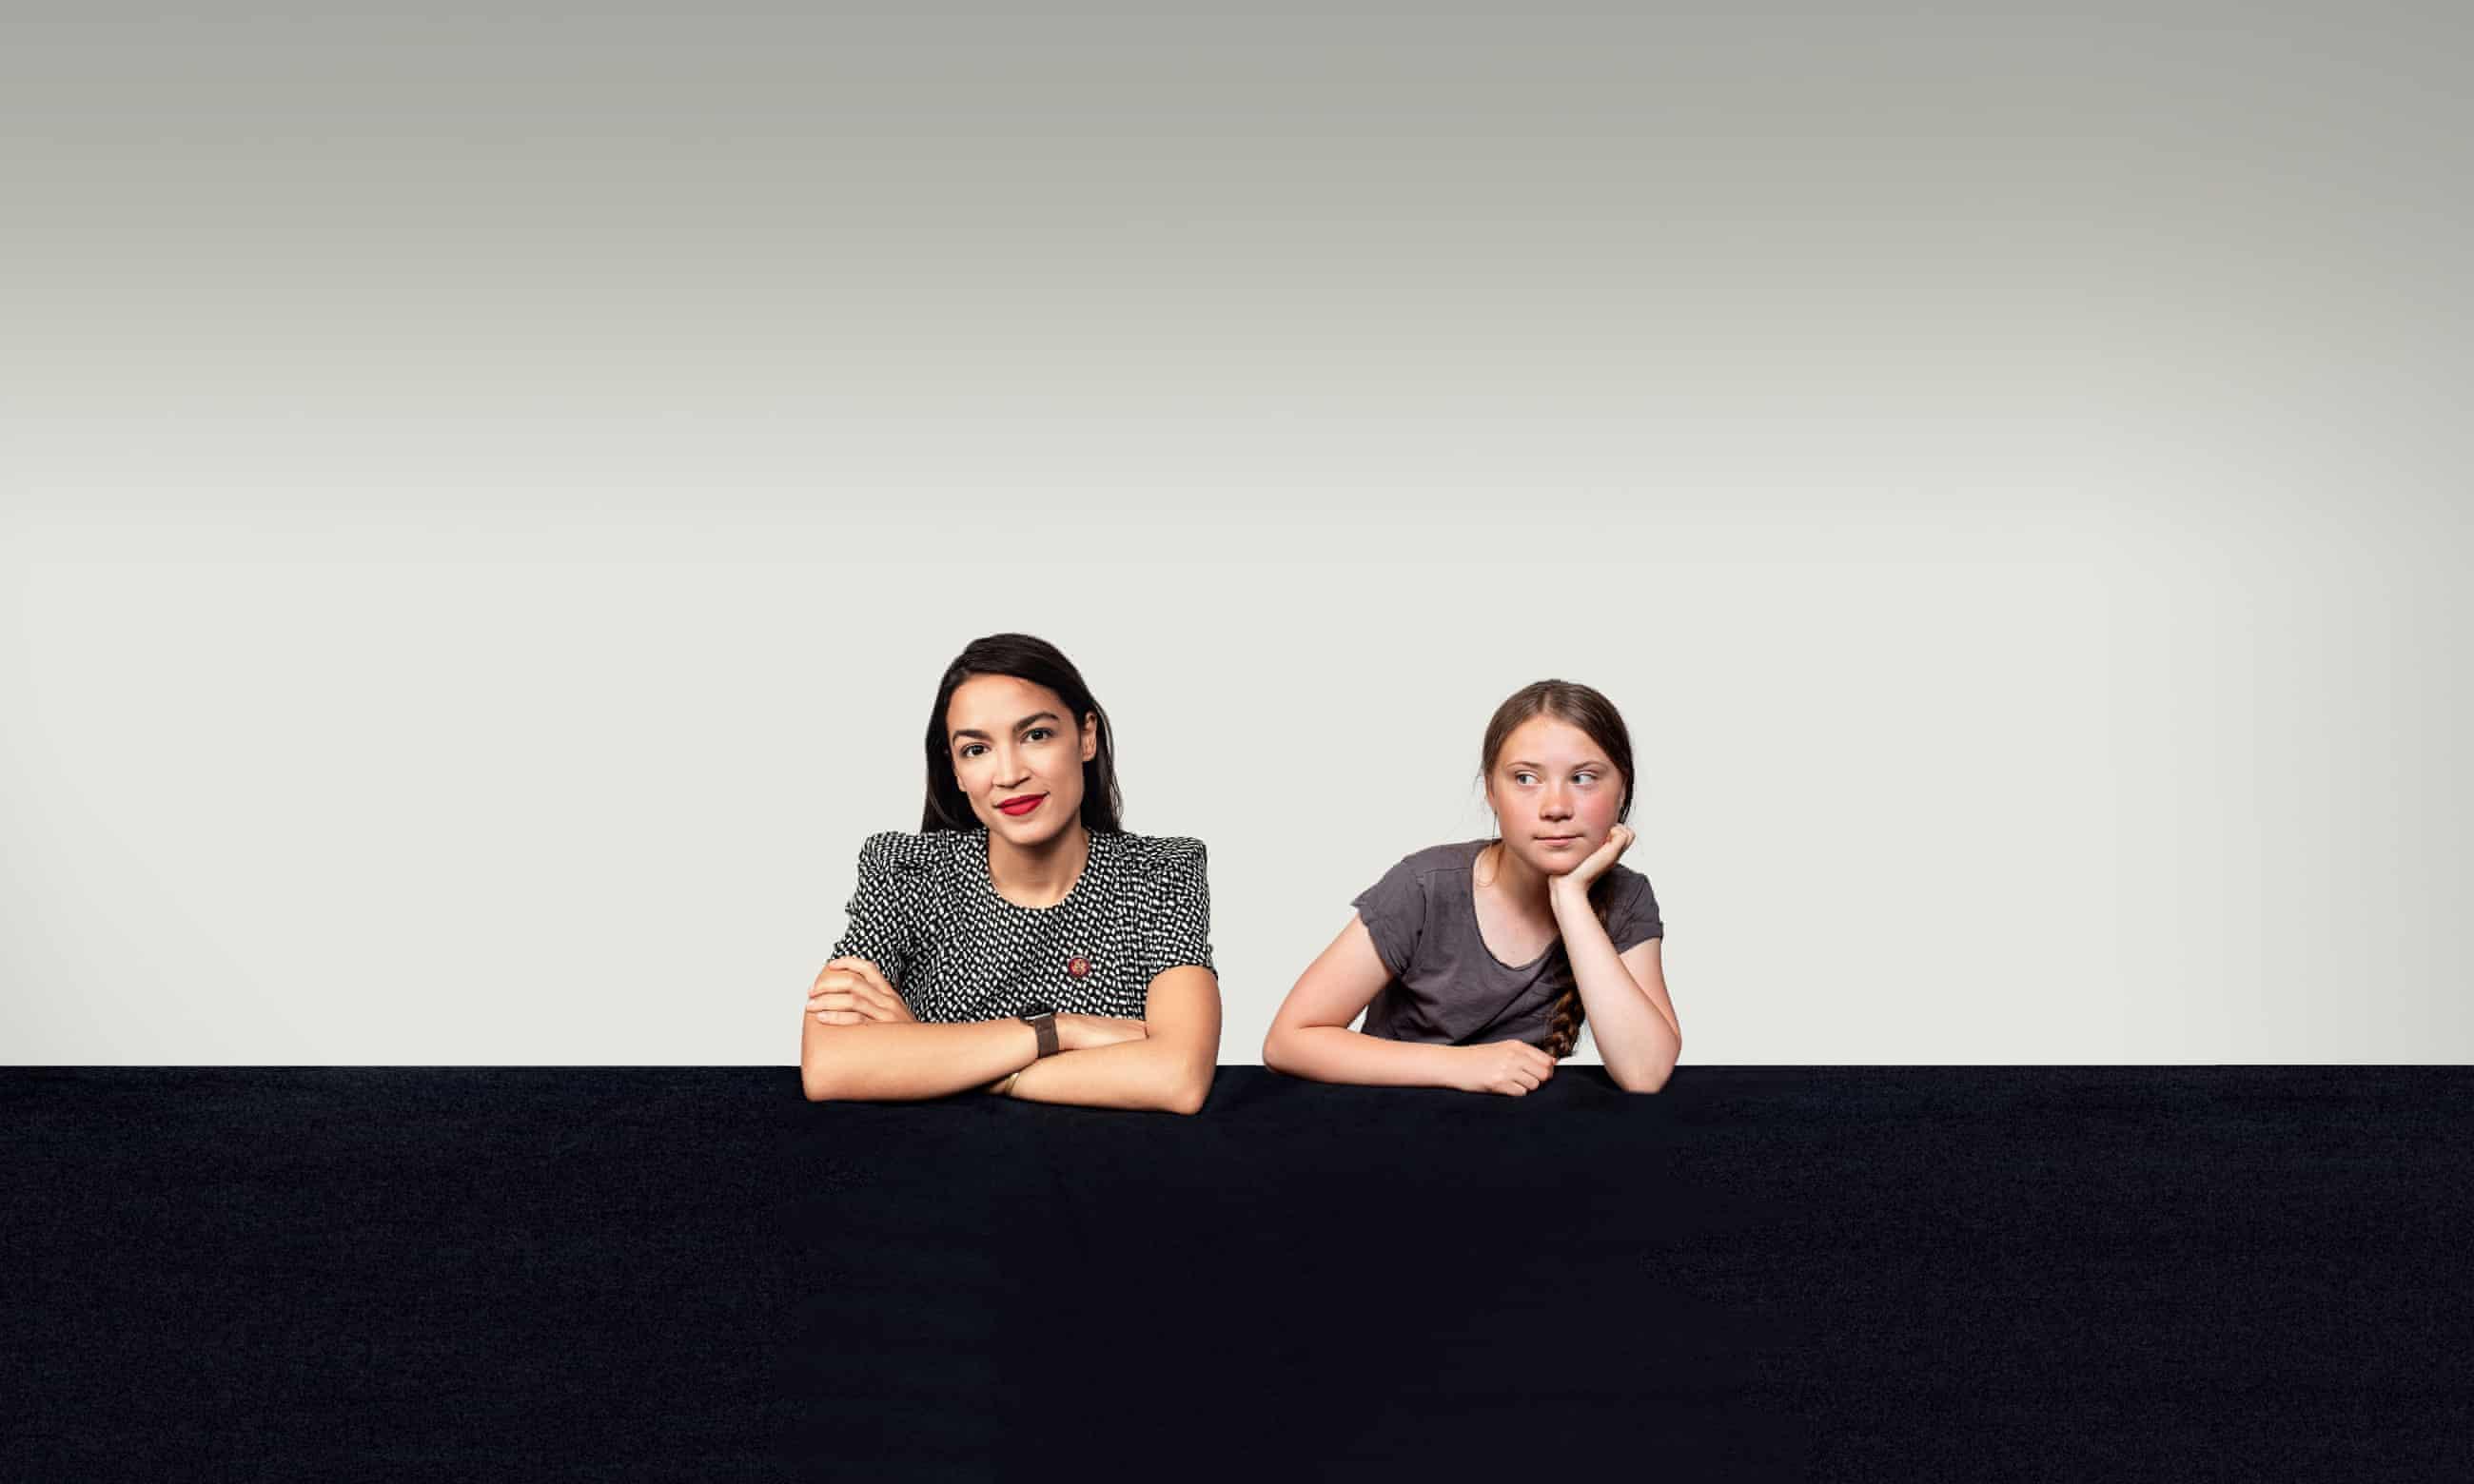 When Alexandria Ocasio-Cortez met Greta Thunberg: 'Hope is contagious'